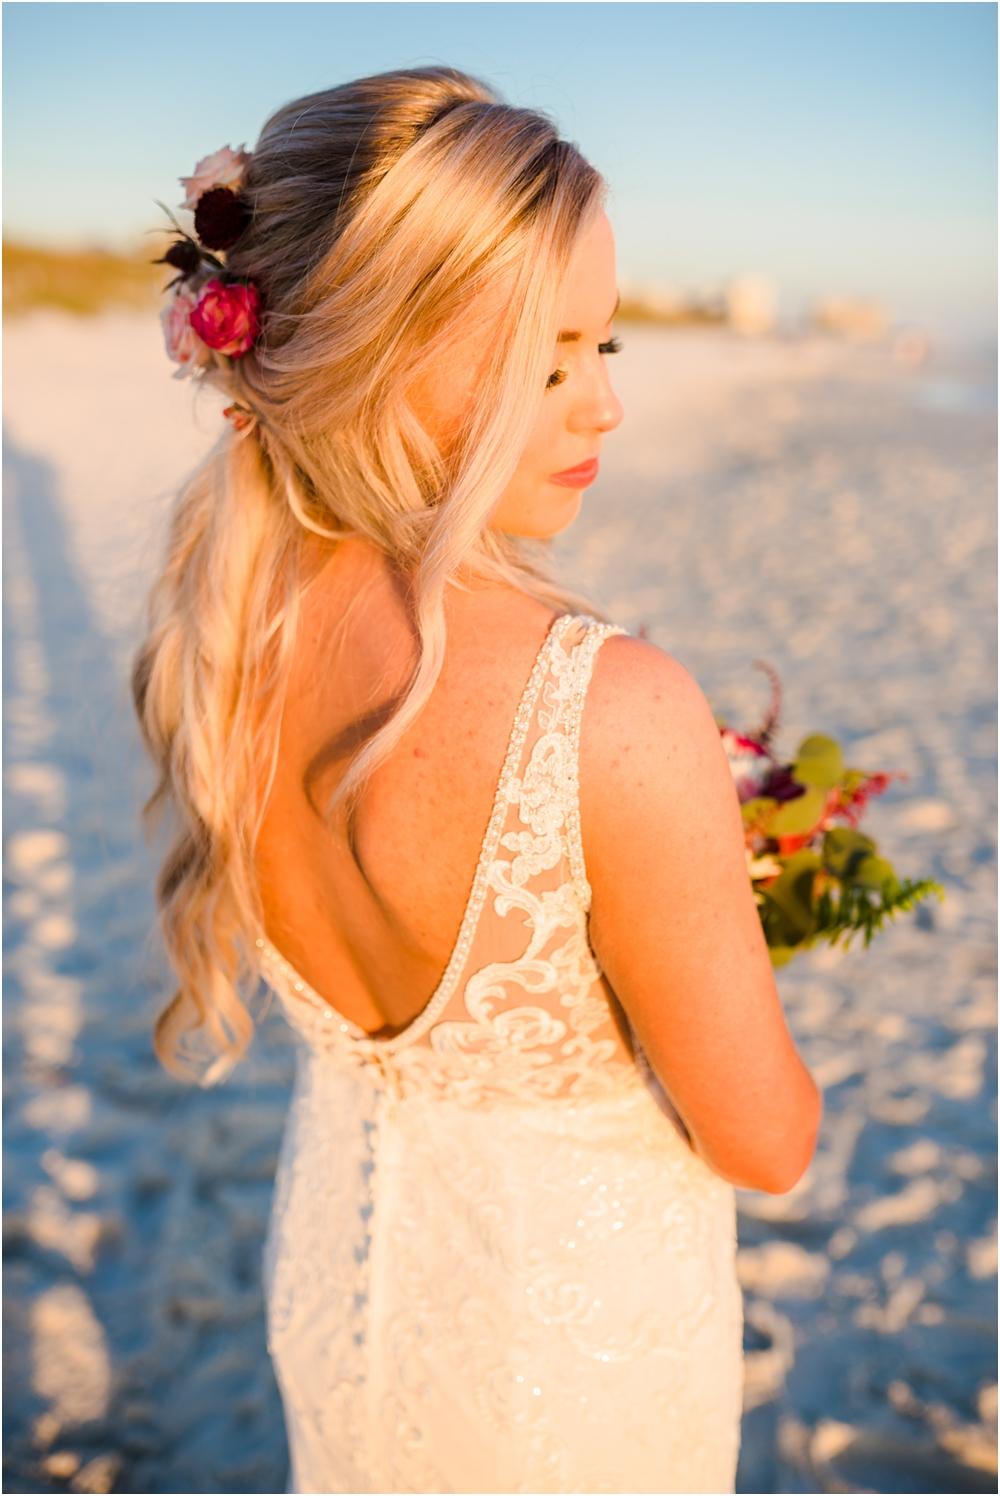 mcglothlin-wedding-kiersten-stevenson-photography-30a-panama-city-beach-dothan-tallahassee-(102-of-145).jpg